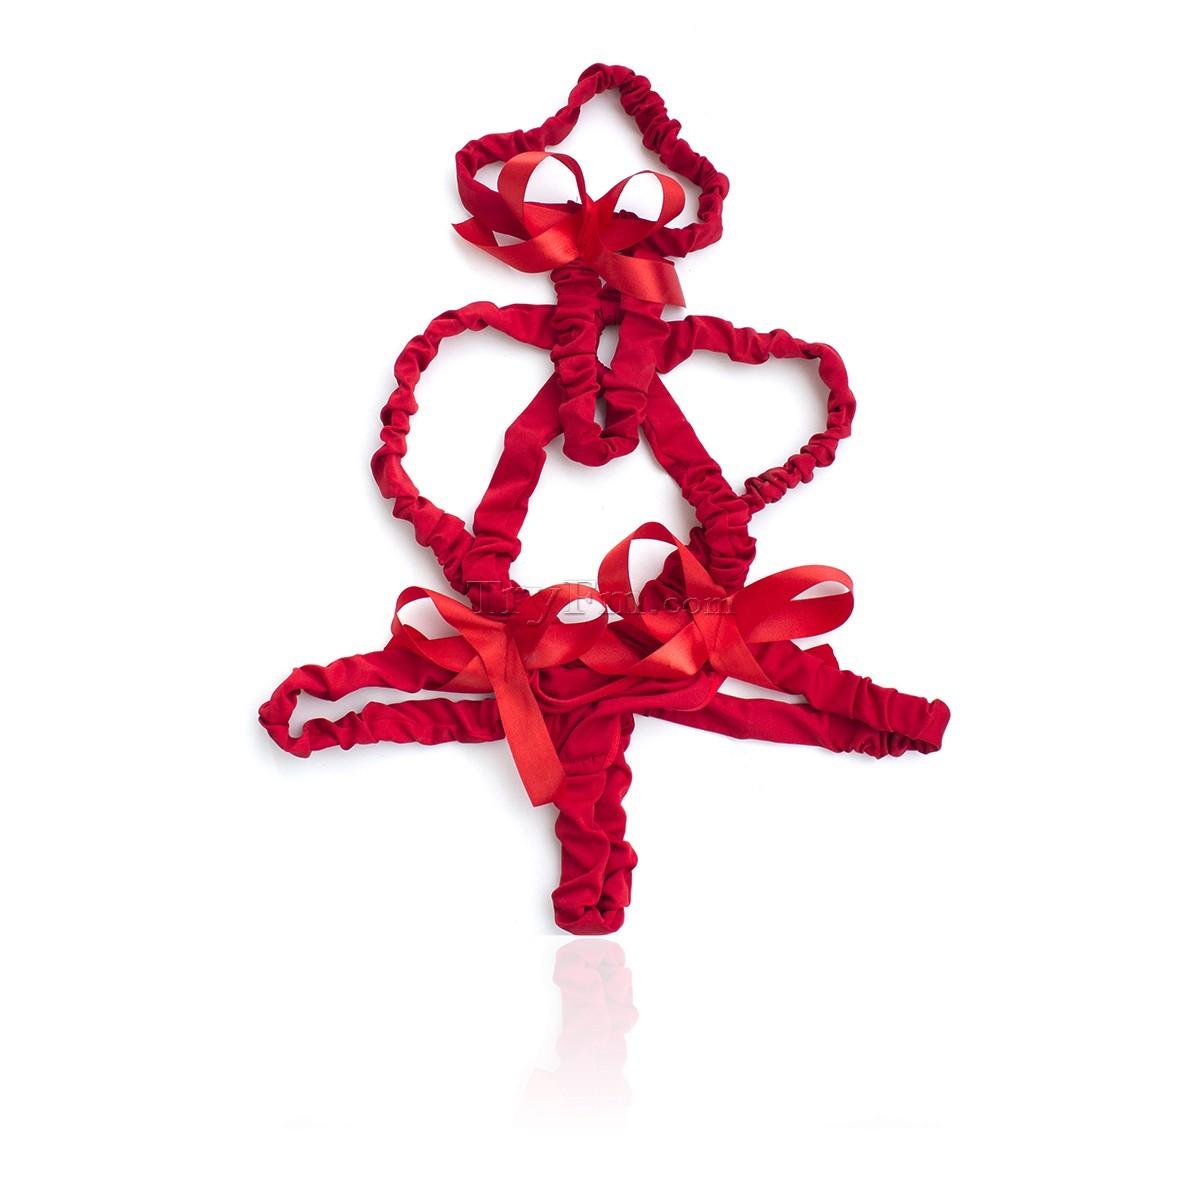 7-Temptation-Red-Rope-9.jpg